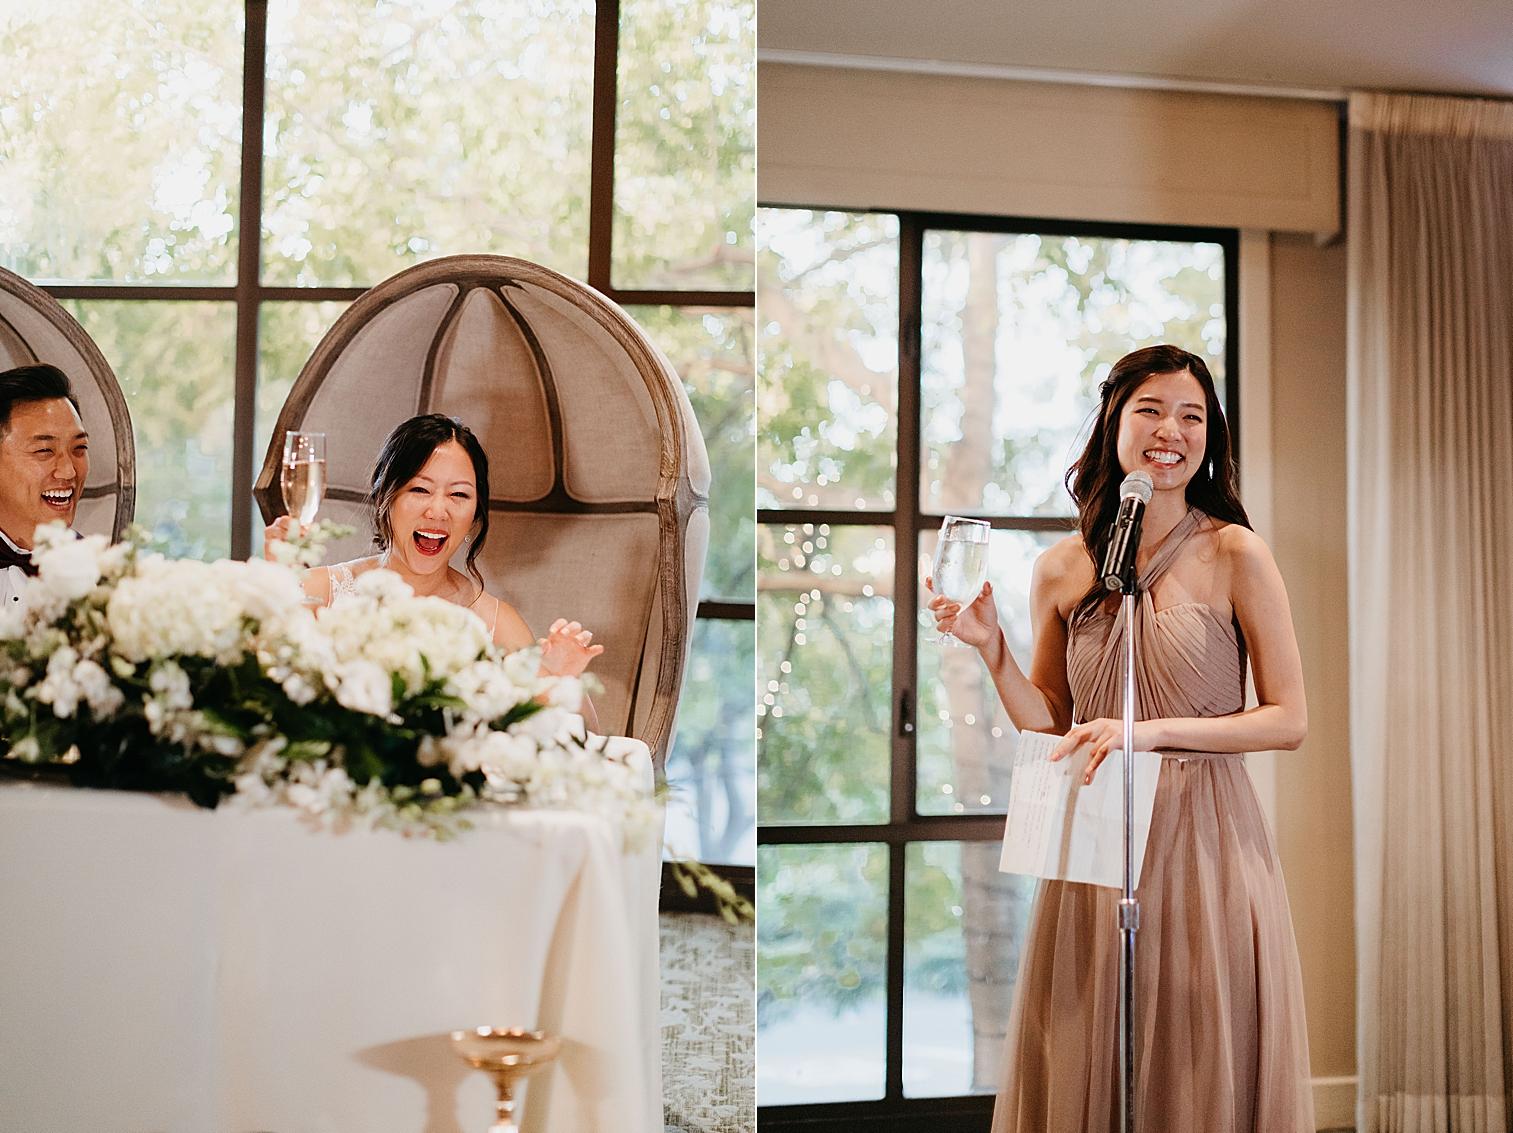 Secret-Garden-Rancho-Santa-Fe-Wedding-116.jpg